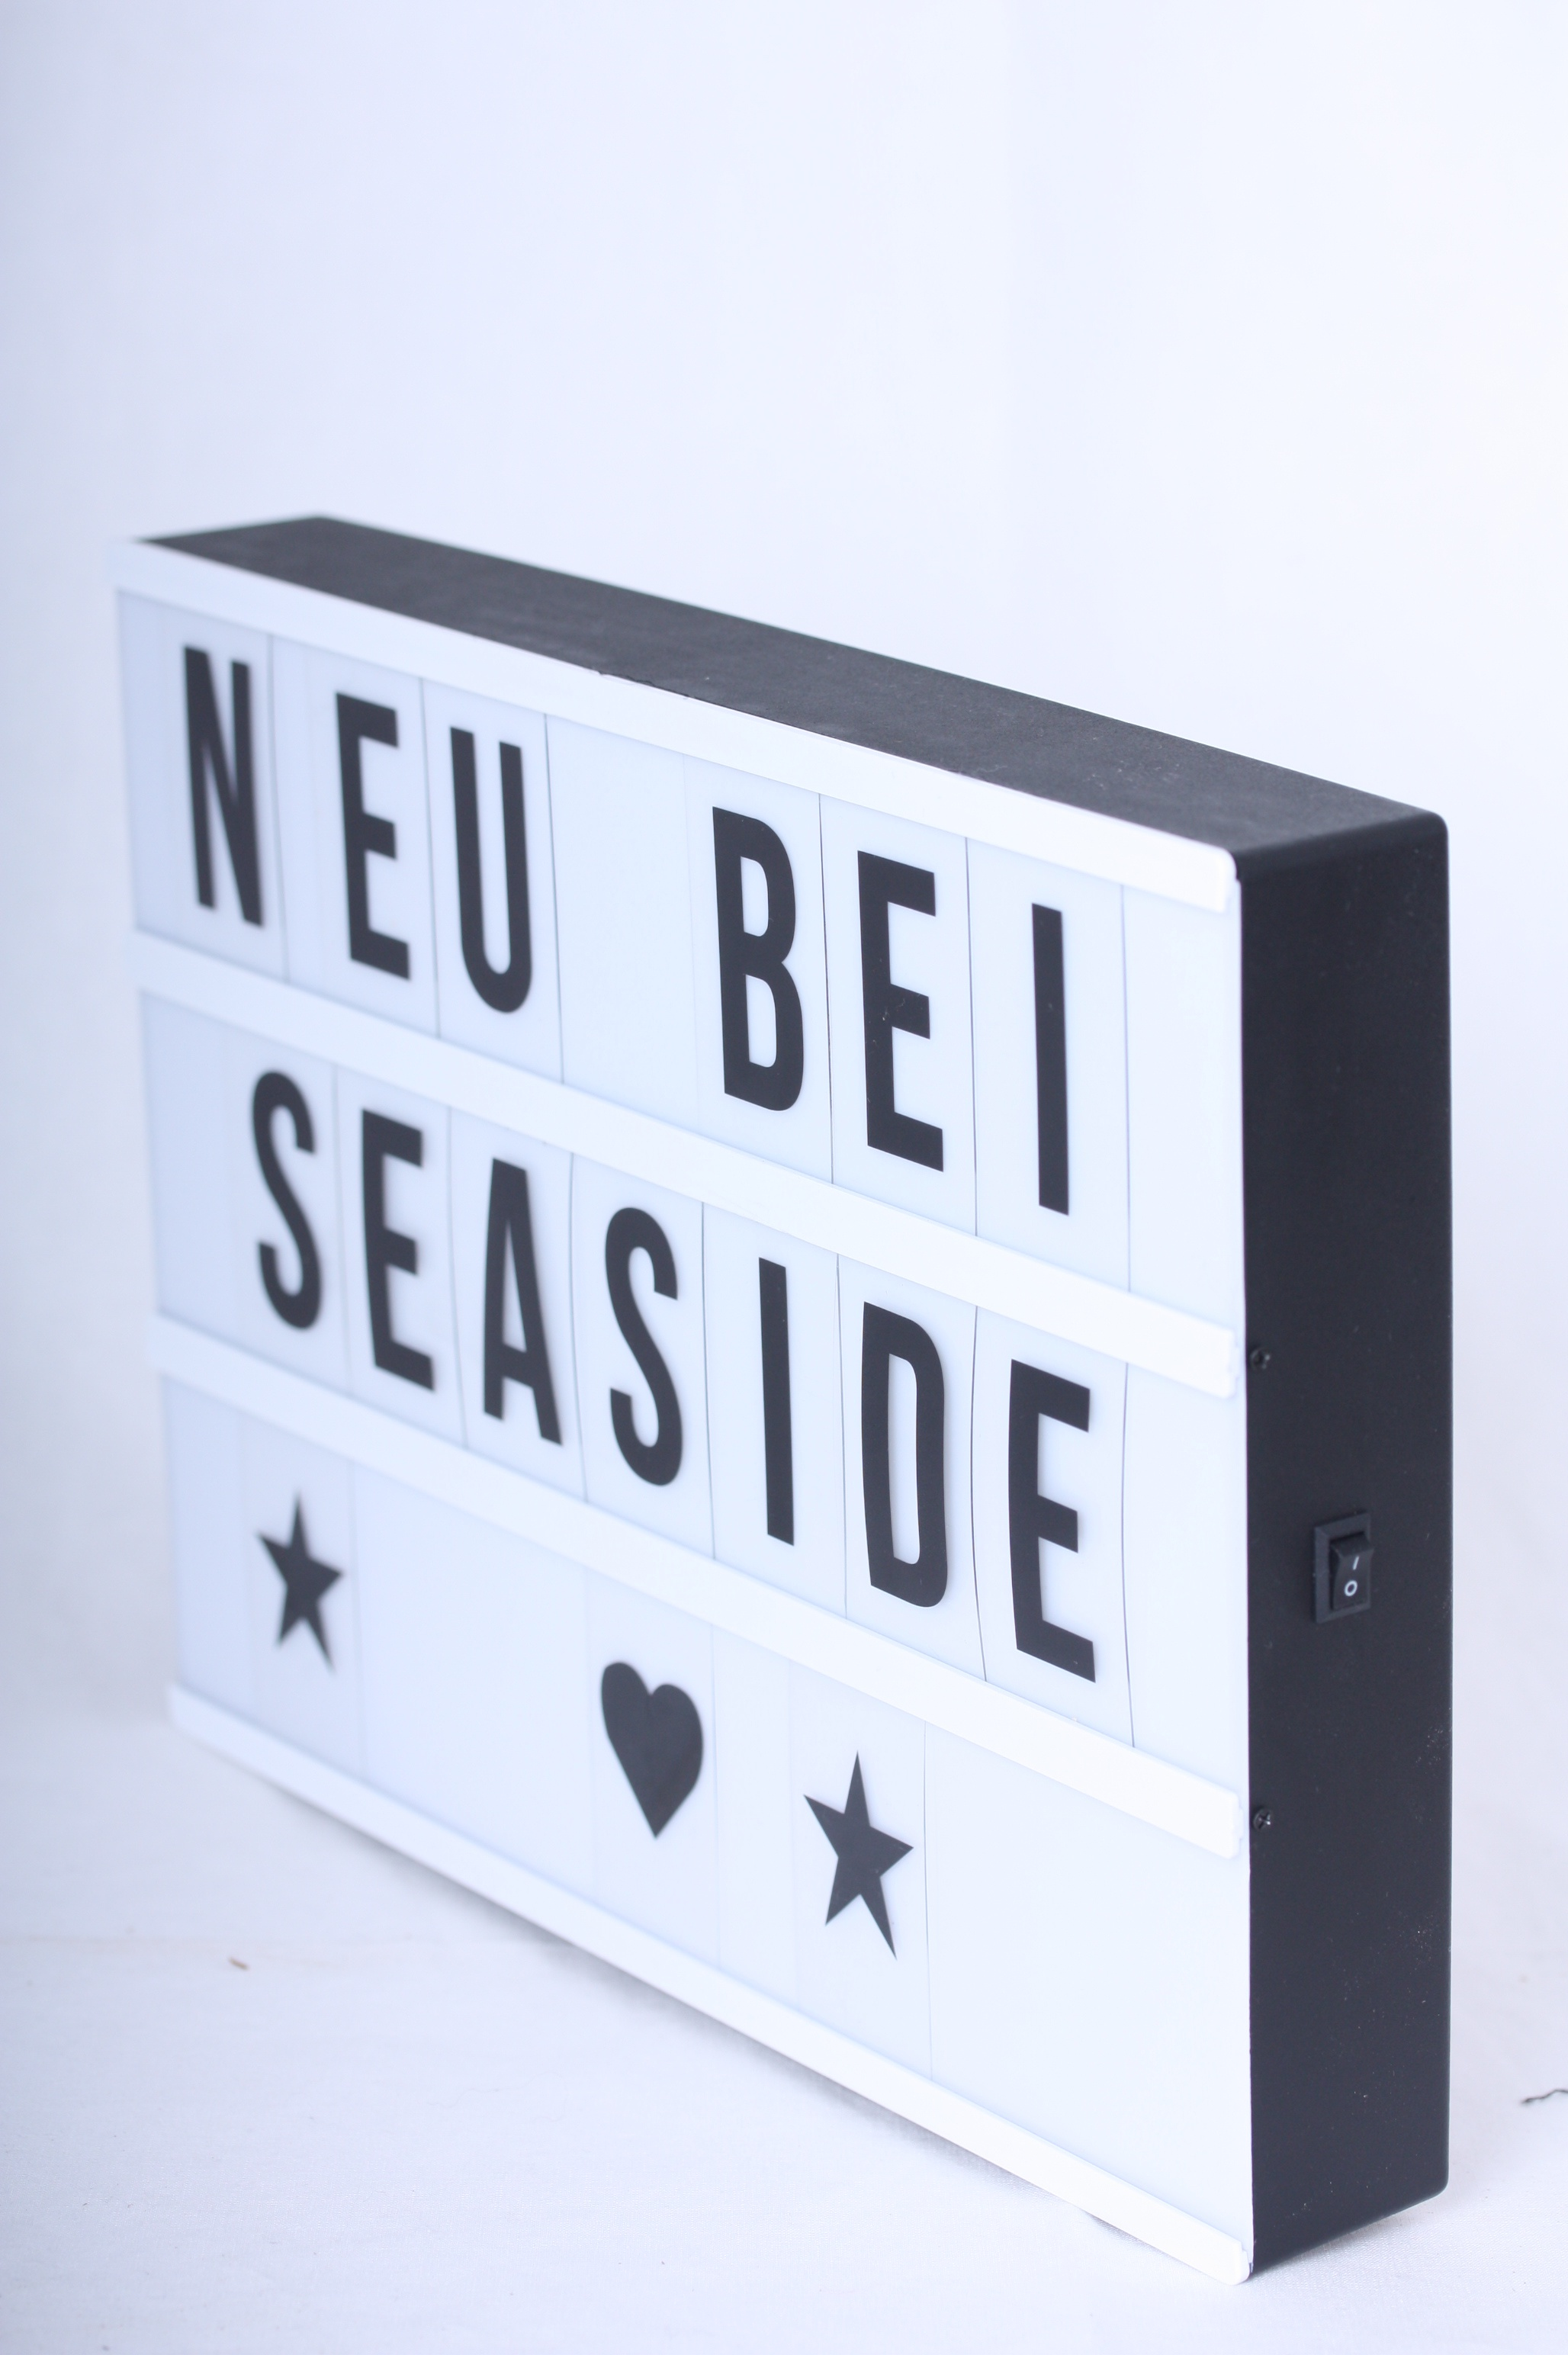 led lightbox a4 inkl buchstaben und symbole lichtbox. Black Bedroom Furniture Sets. Home Design Ideas